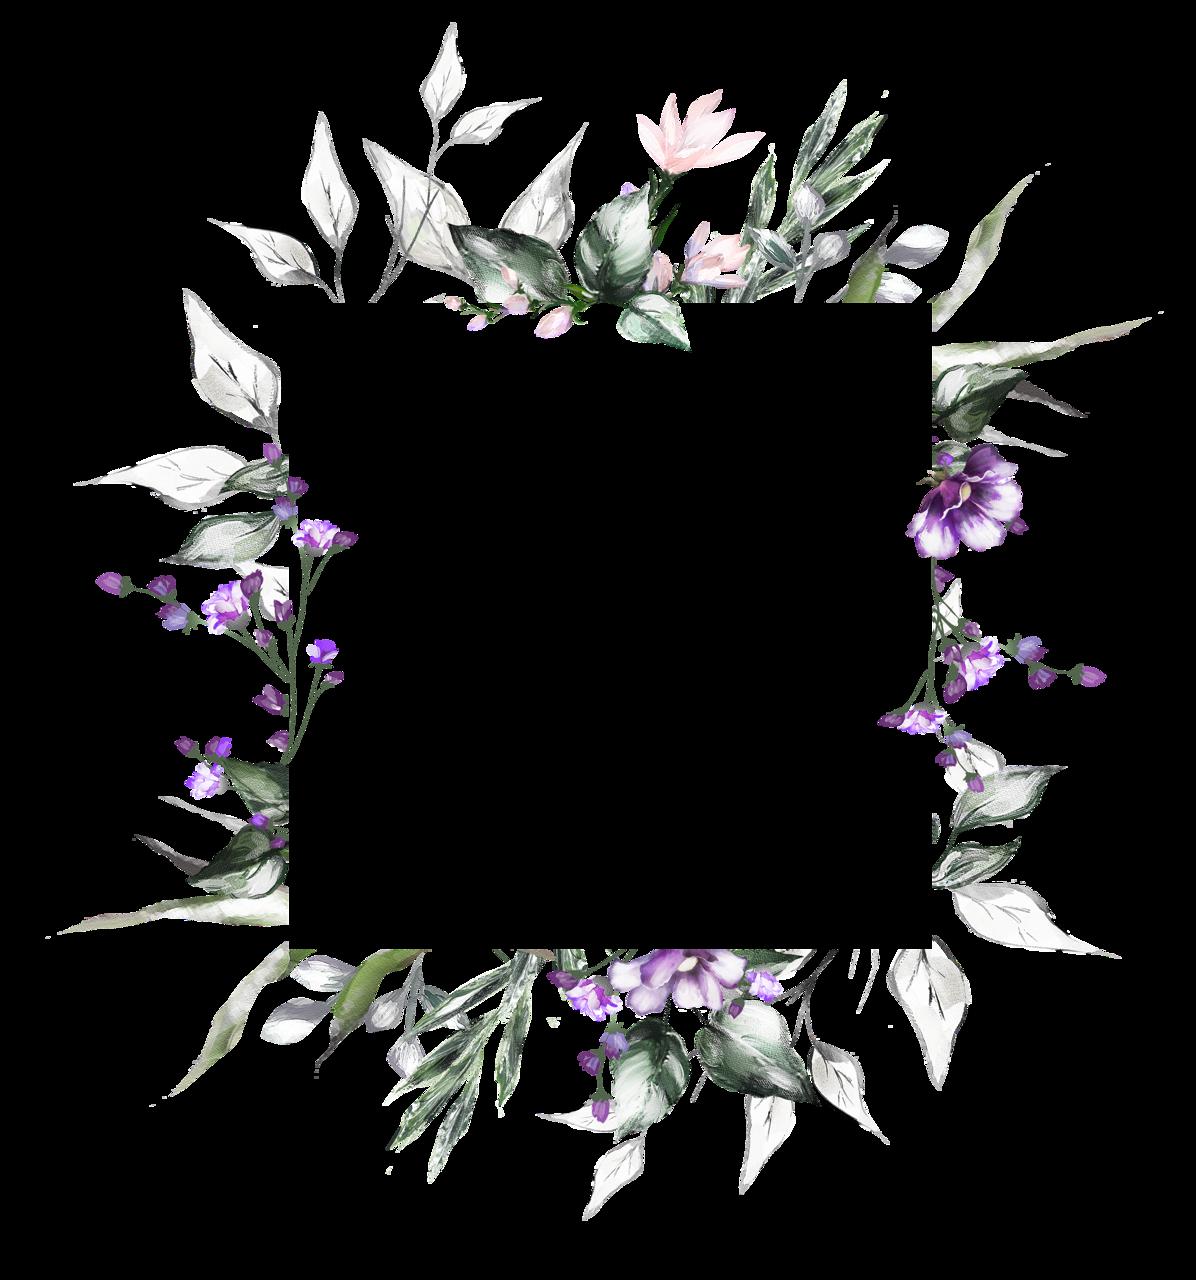 Цветочная рамка PNG